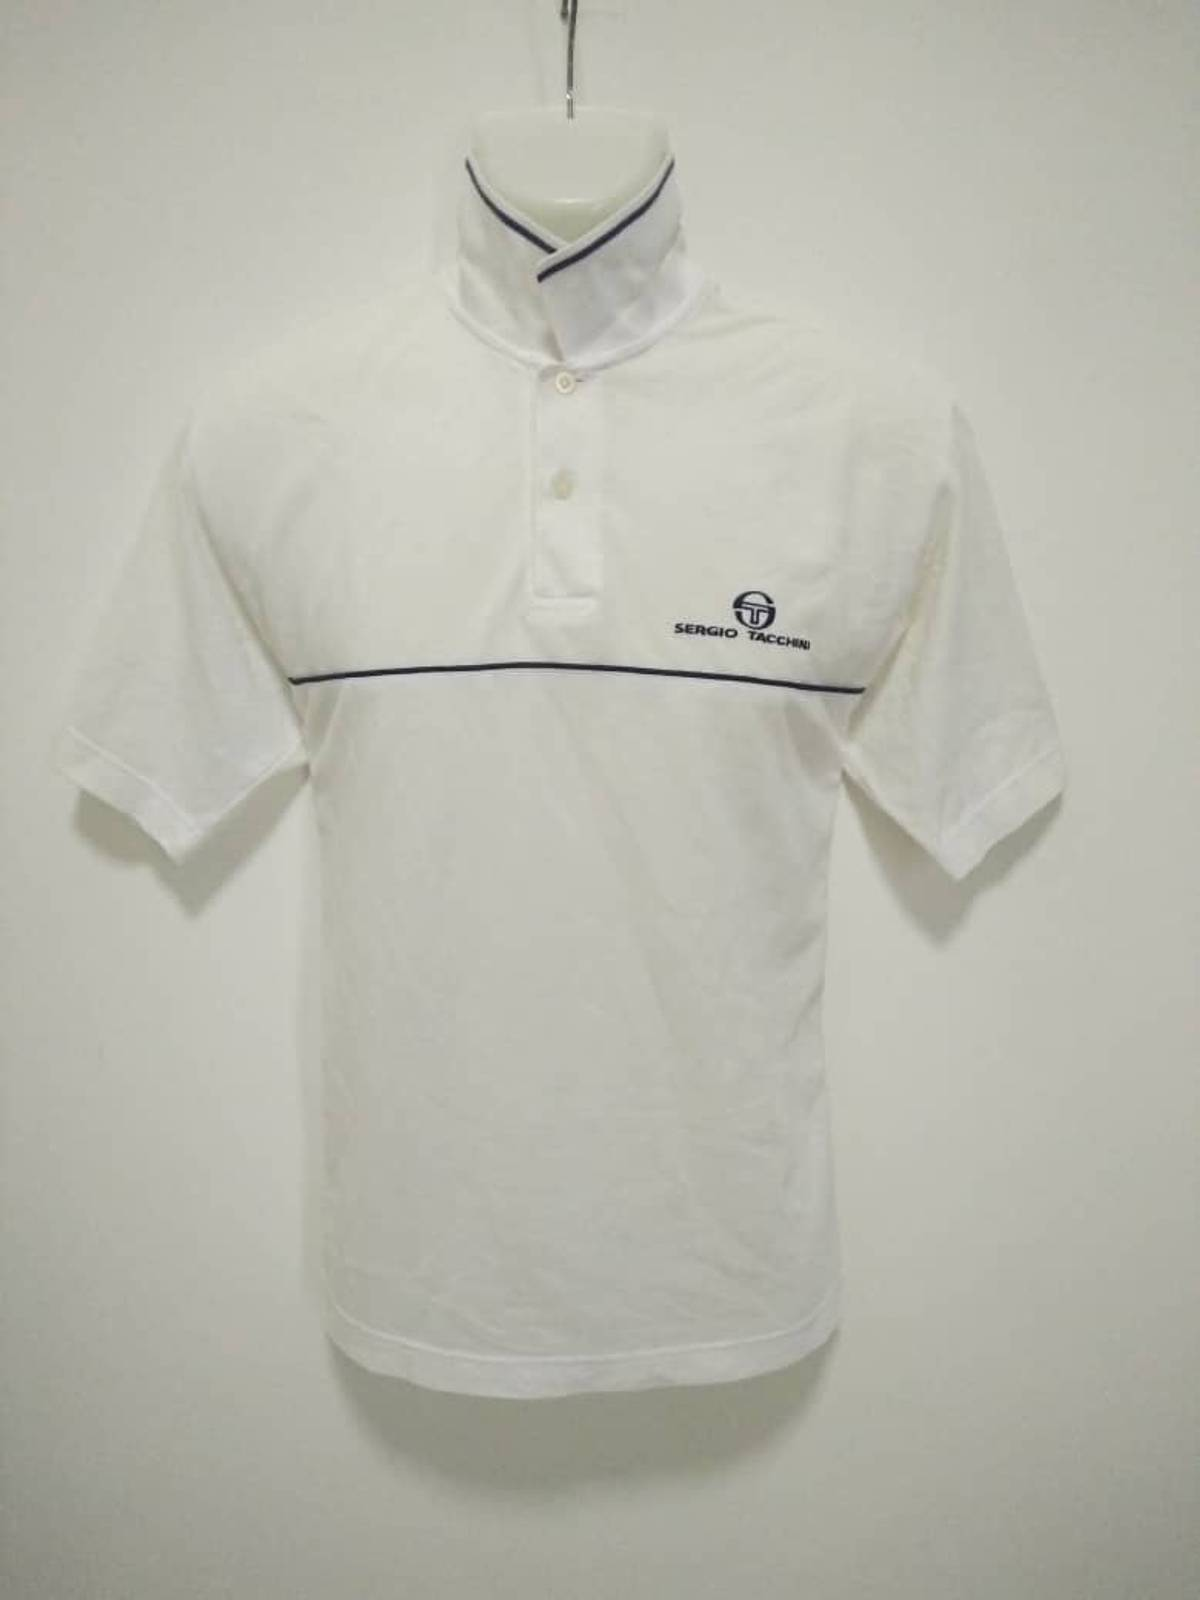 58383c5b9e43 Italian Designers Sergio Tacchini Polo Shirt ITALIAN FASHION DESIGNER White  Tennis Polo Shirt Medium Size Fila Bjorn Borg Tacchini Tennis Lab Edition  ...